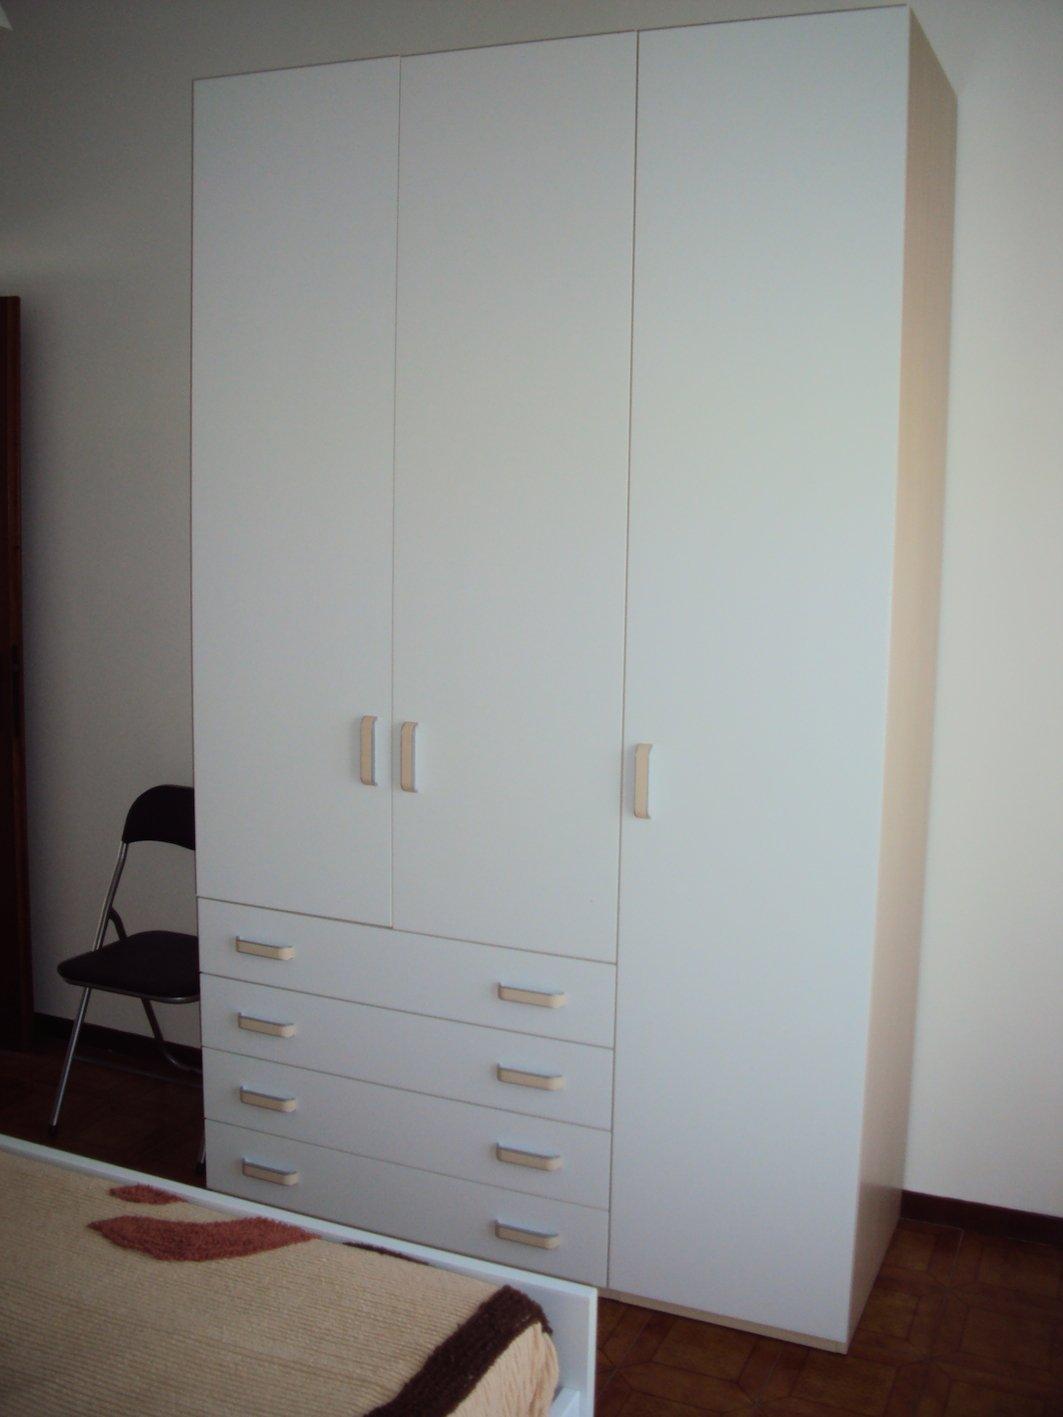 79A – Vada, Trilocale zona Pietra Bianca.